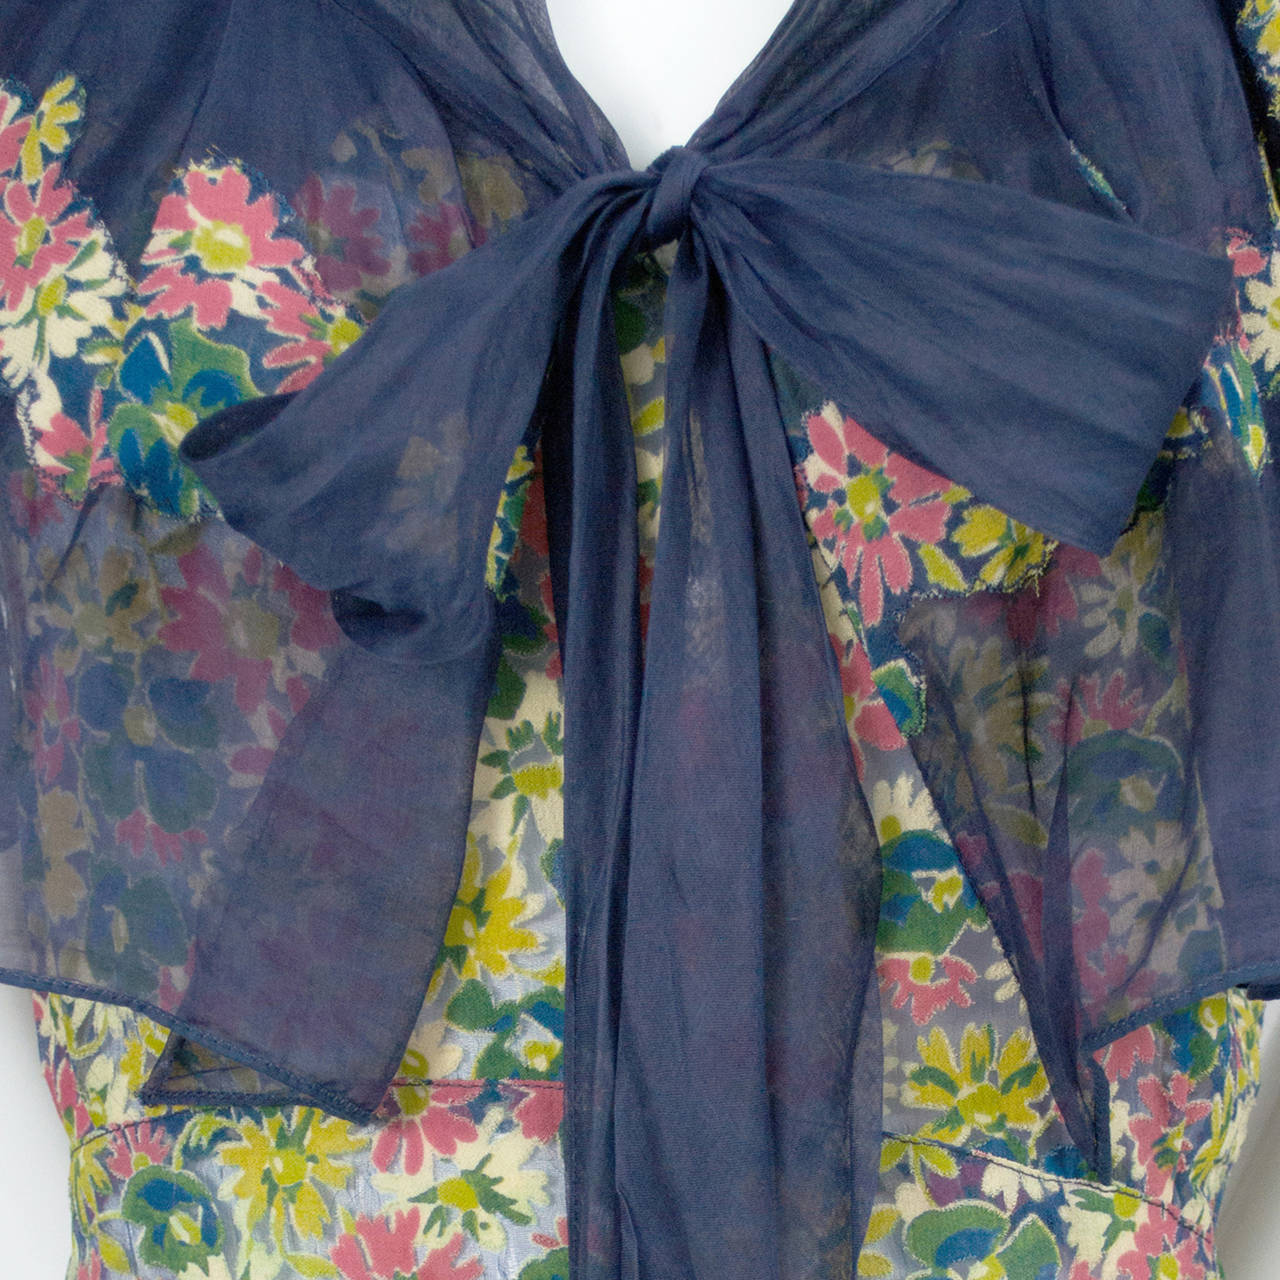 Rare 1930s Vintage Chanel Adaptation Dress Floral Velvet Applique Silk Organza 4